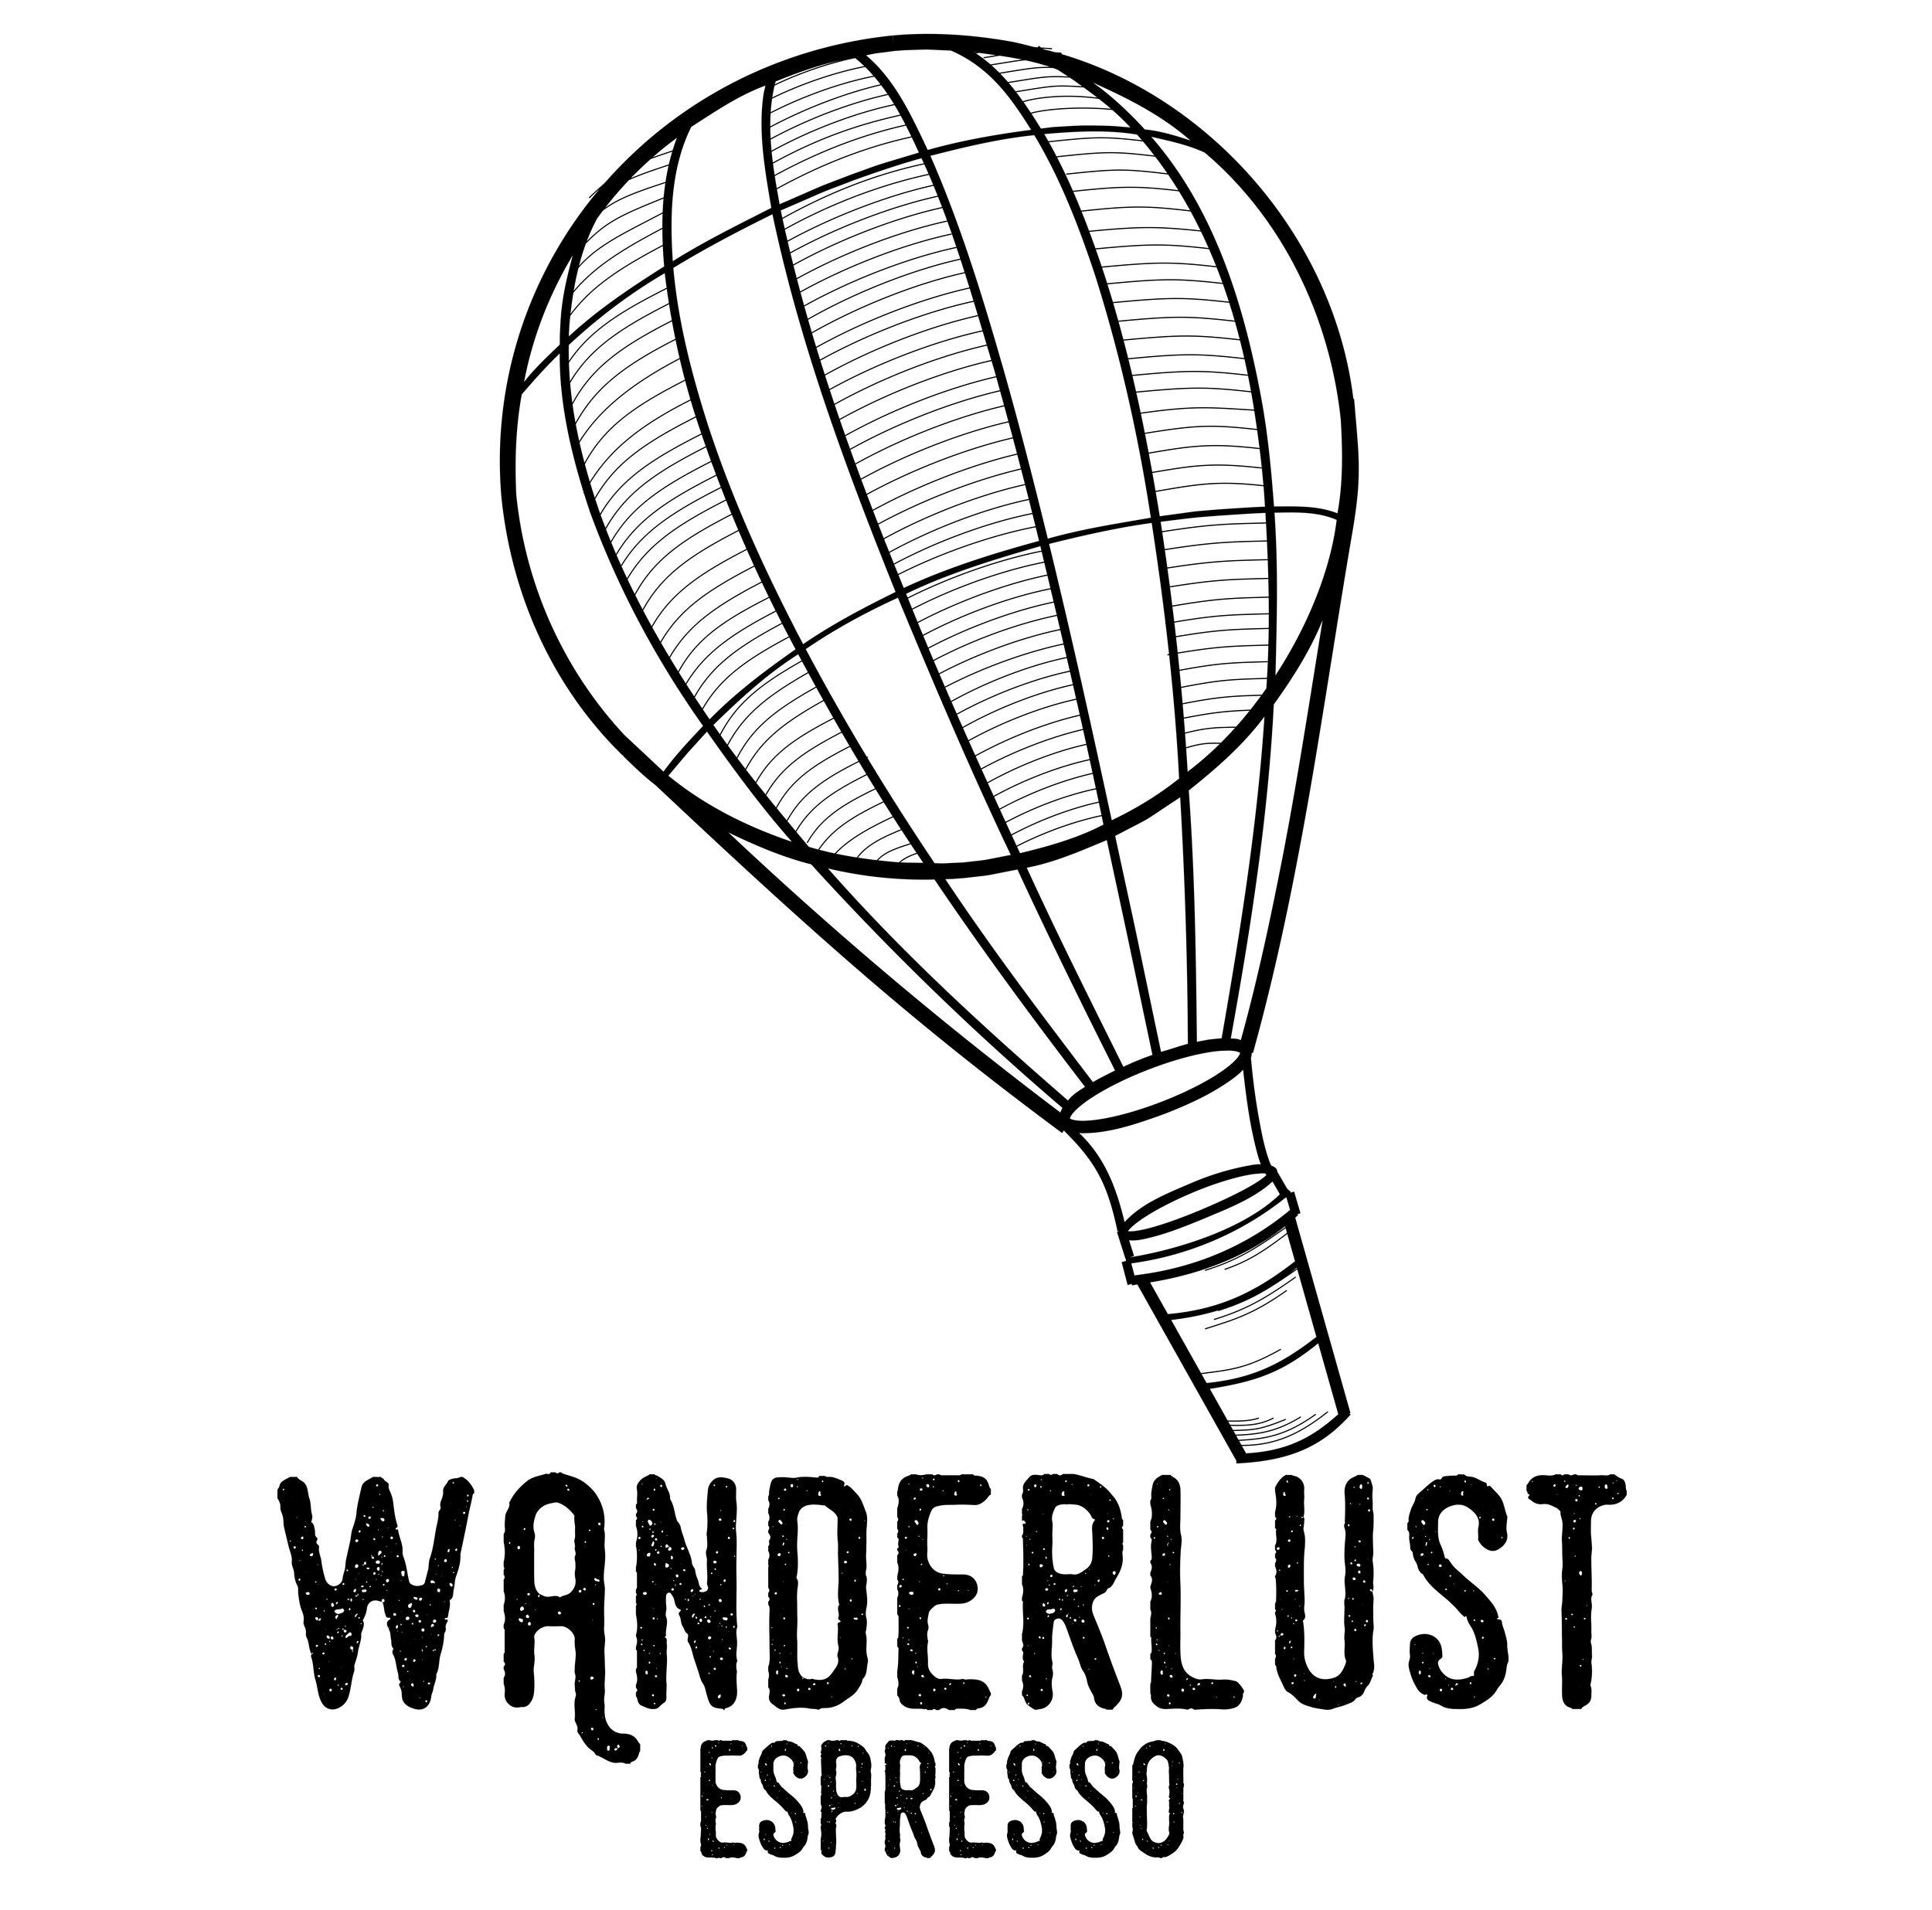 Wanderlust Espresso Logo.jpg